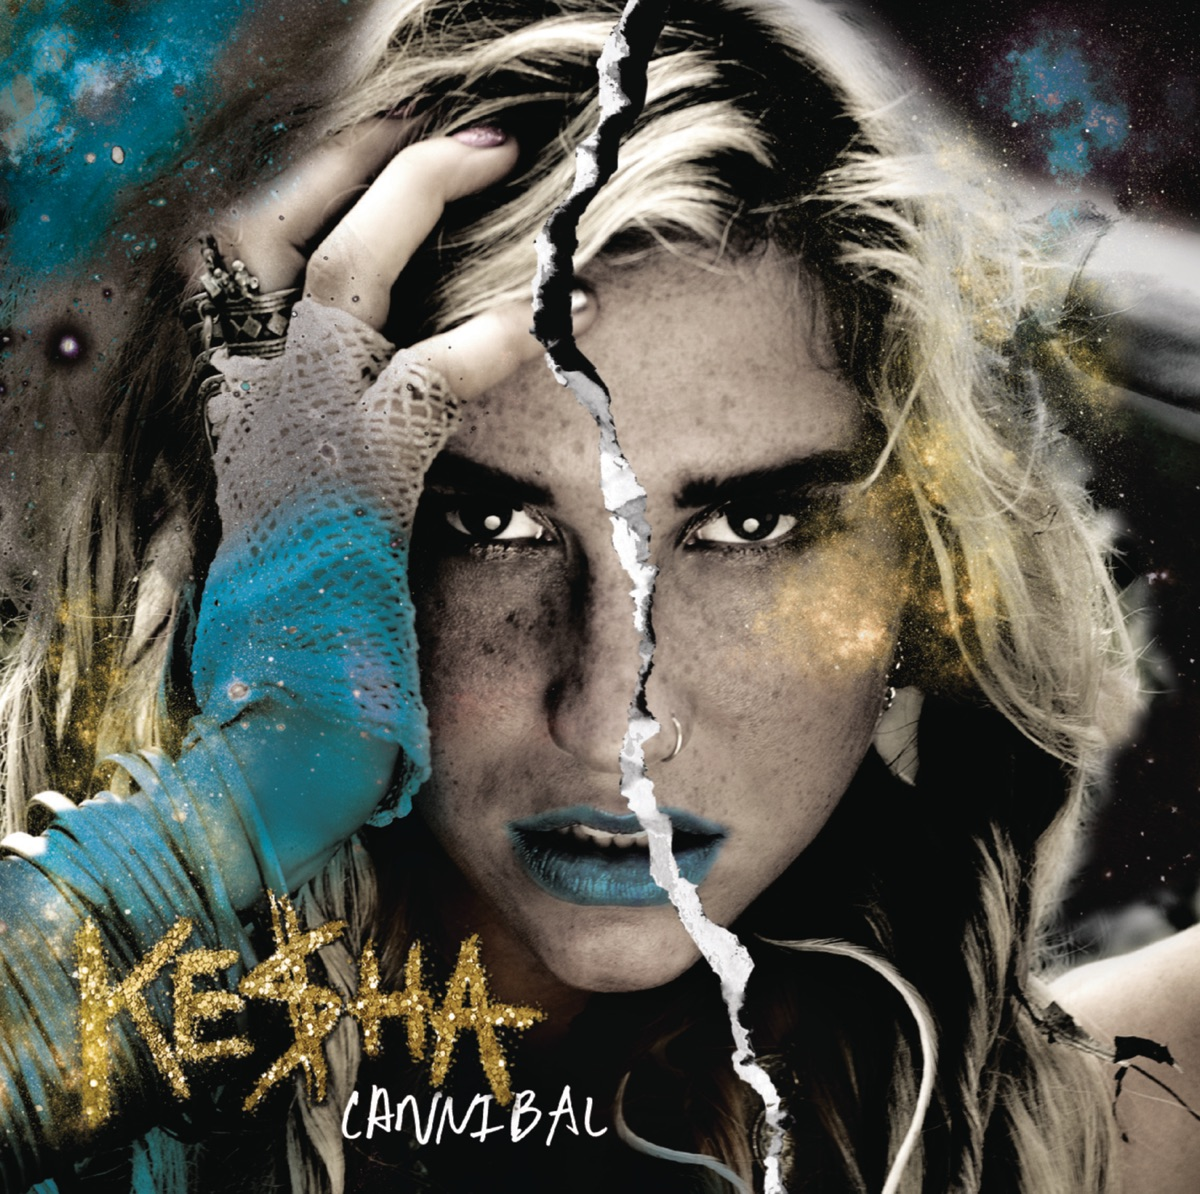 Cannibal Kesha CD cover